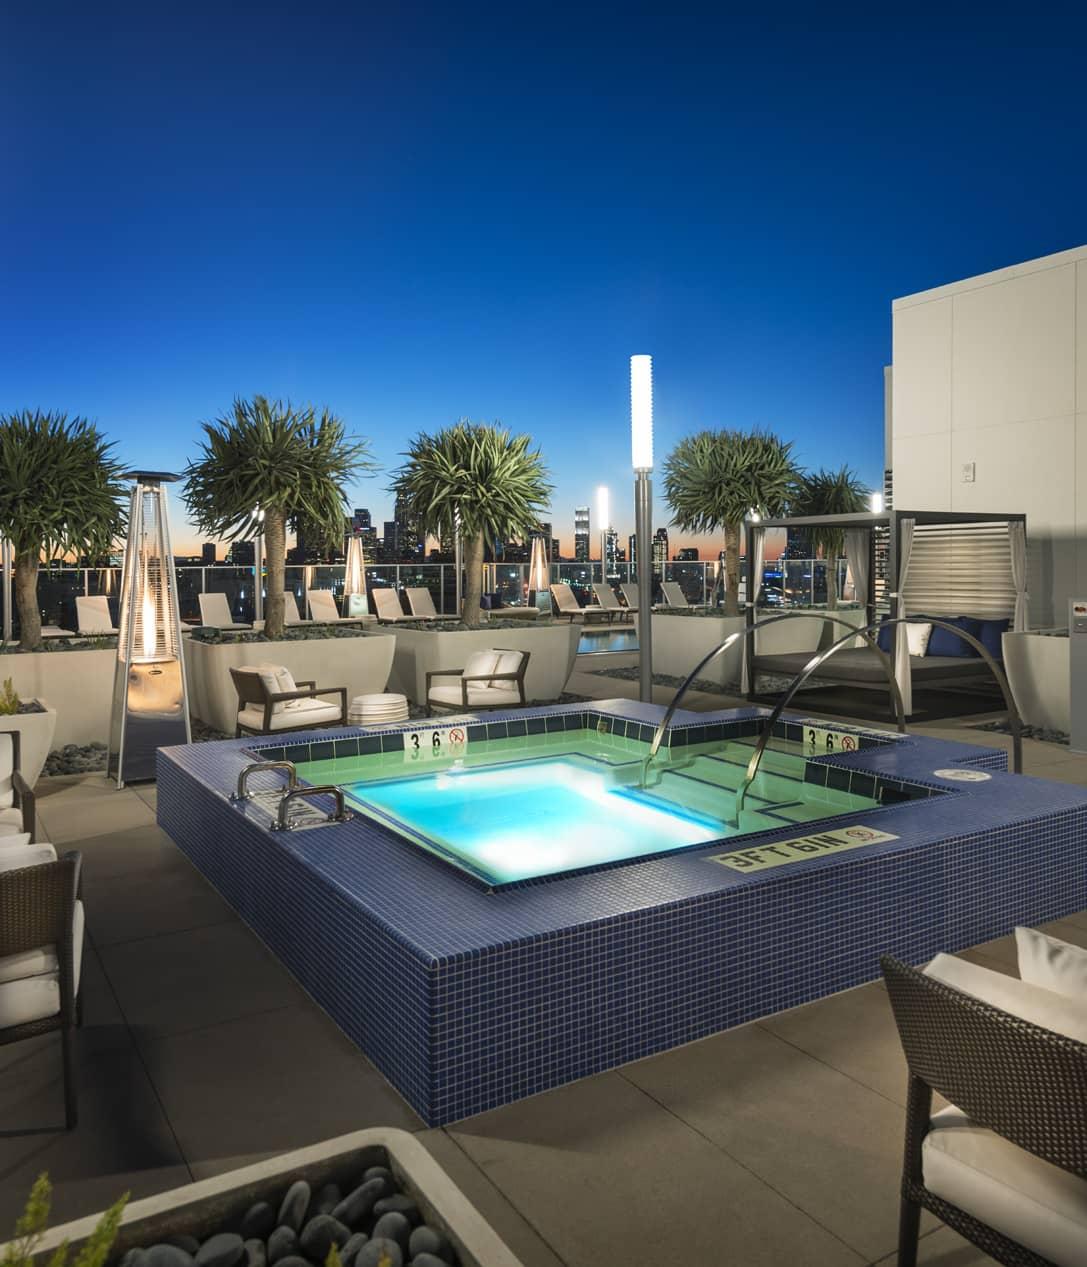 3033 Wilshire Corporate Housing-Sample Image of Los Angeles CA Intern Rental